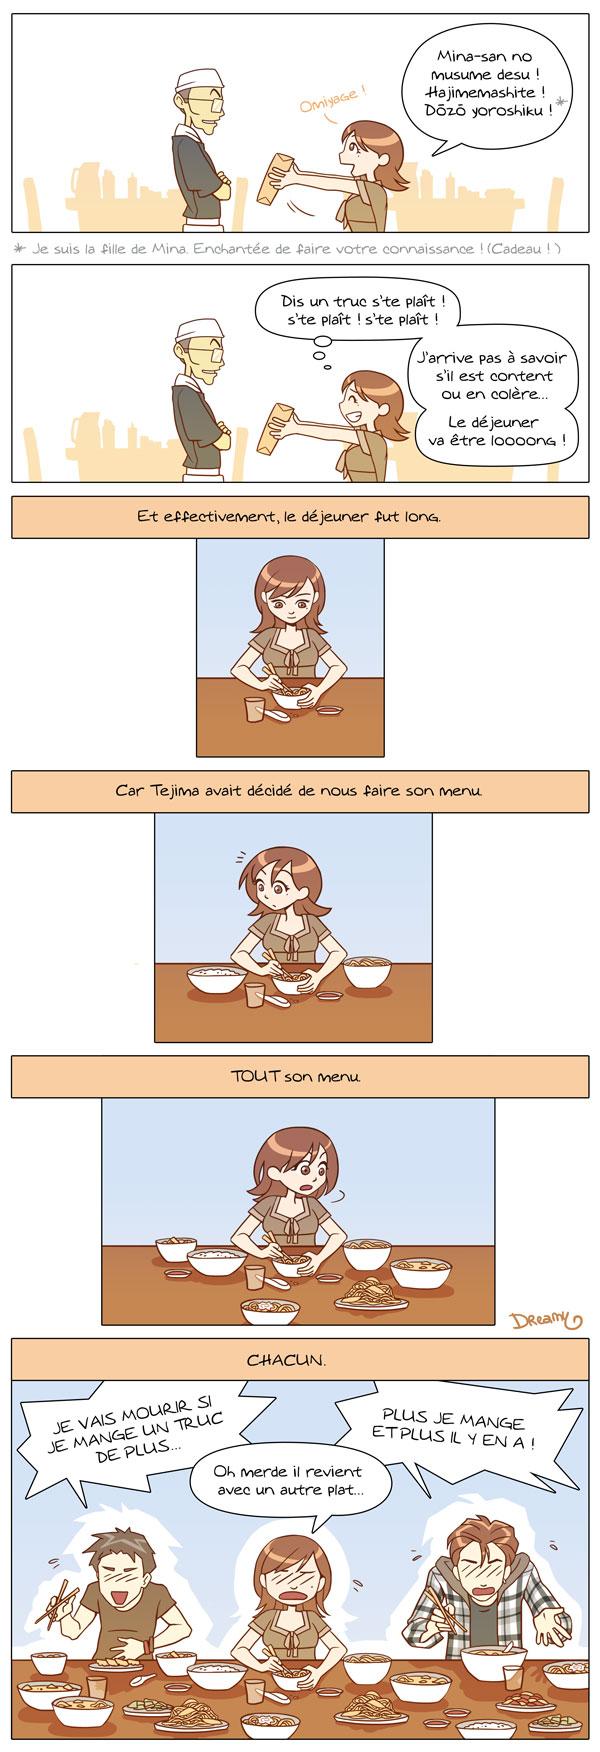 Tejima-san (2/2)